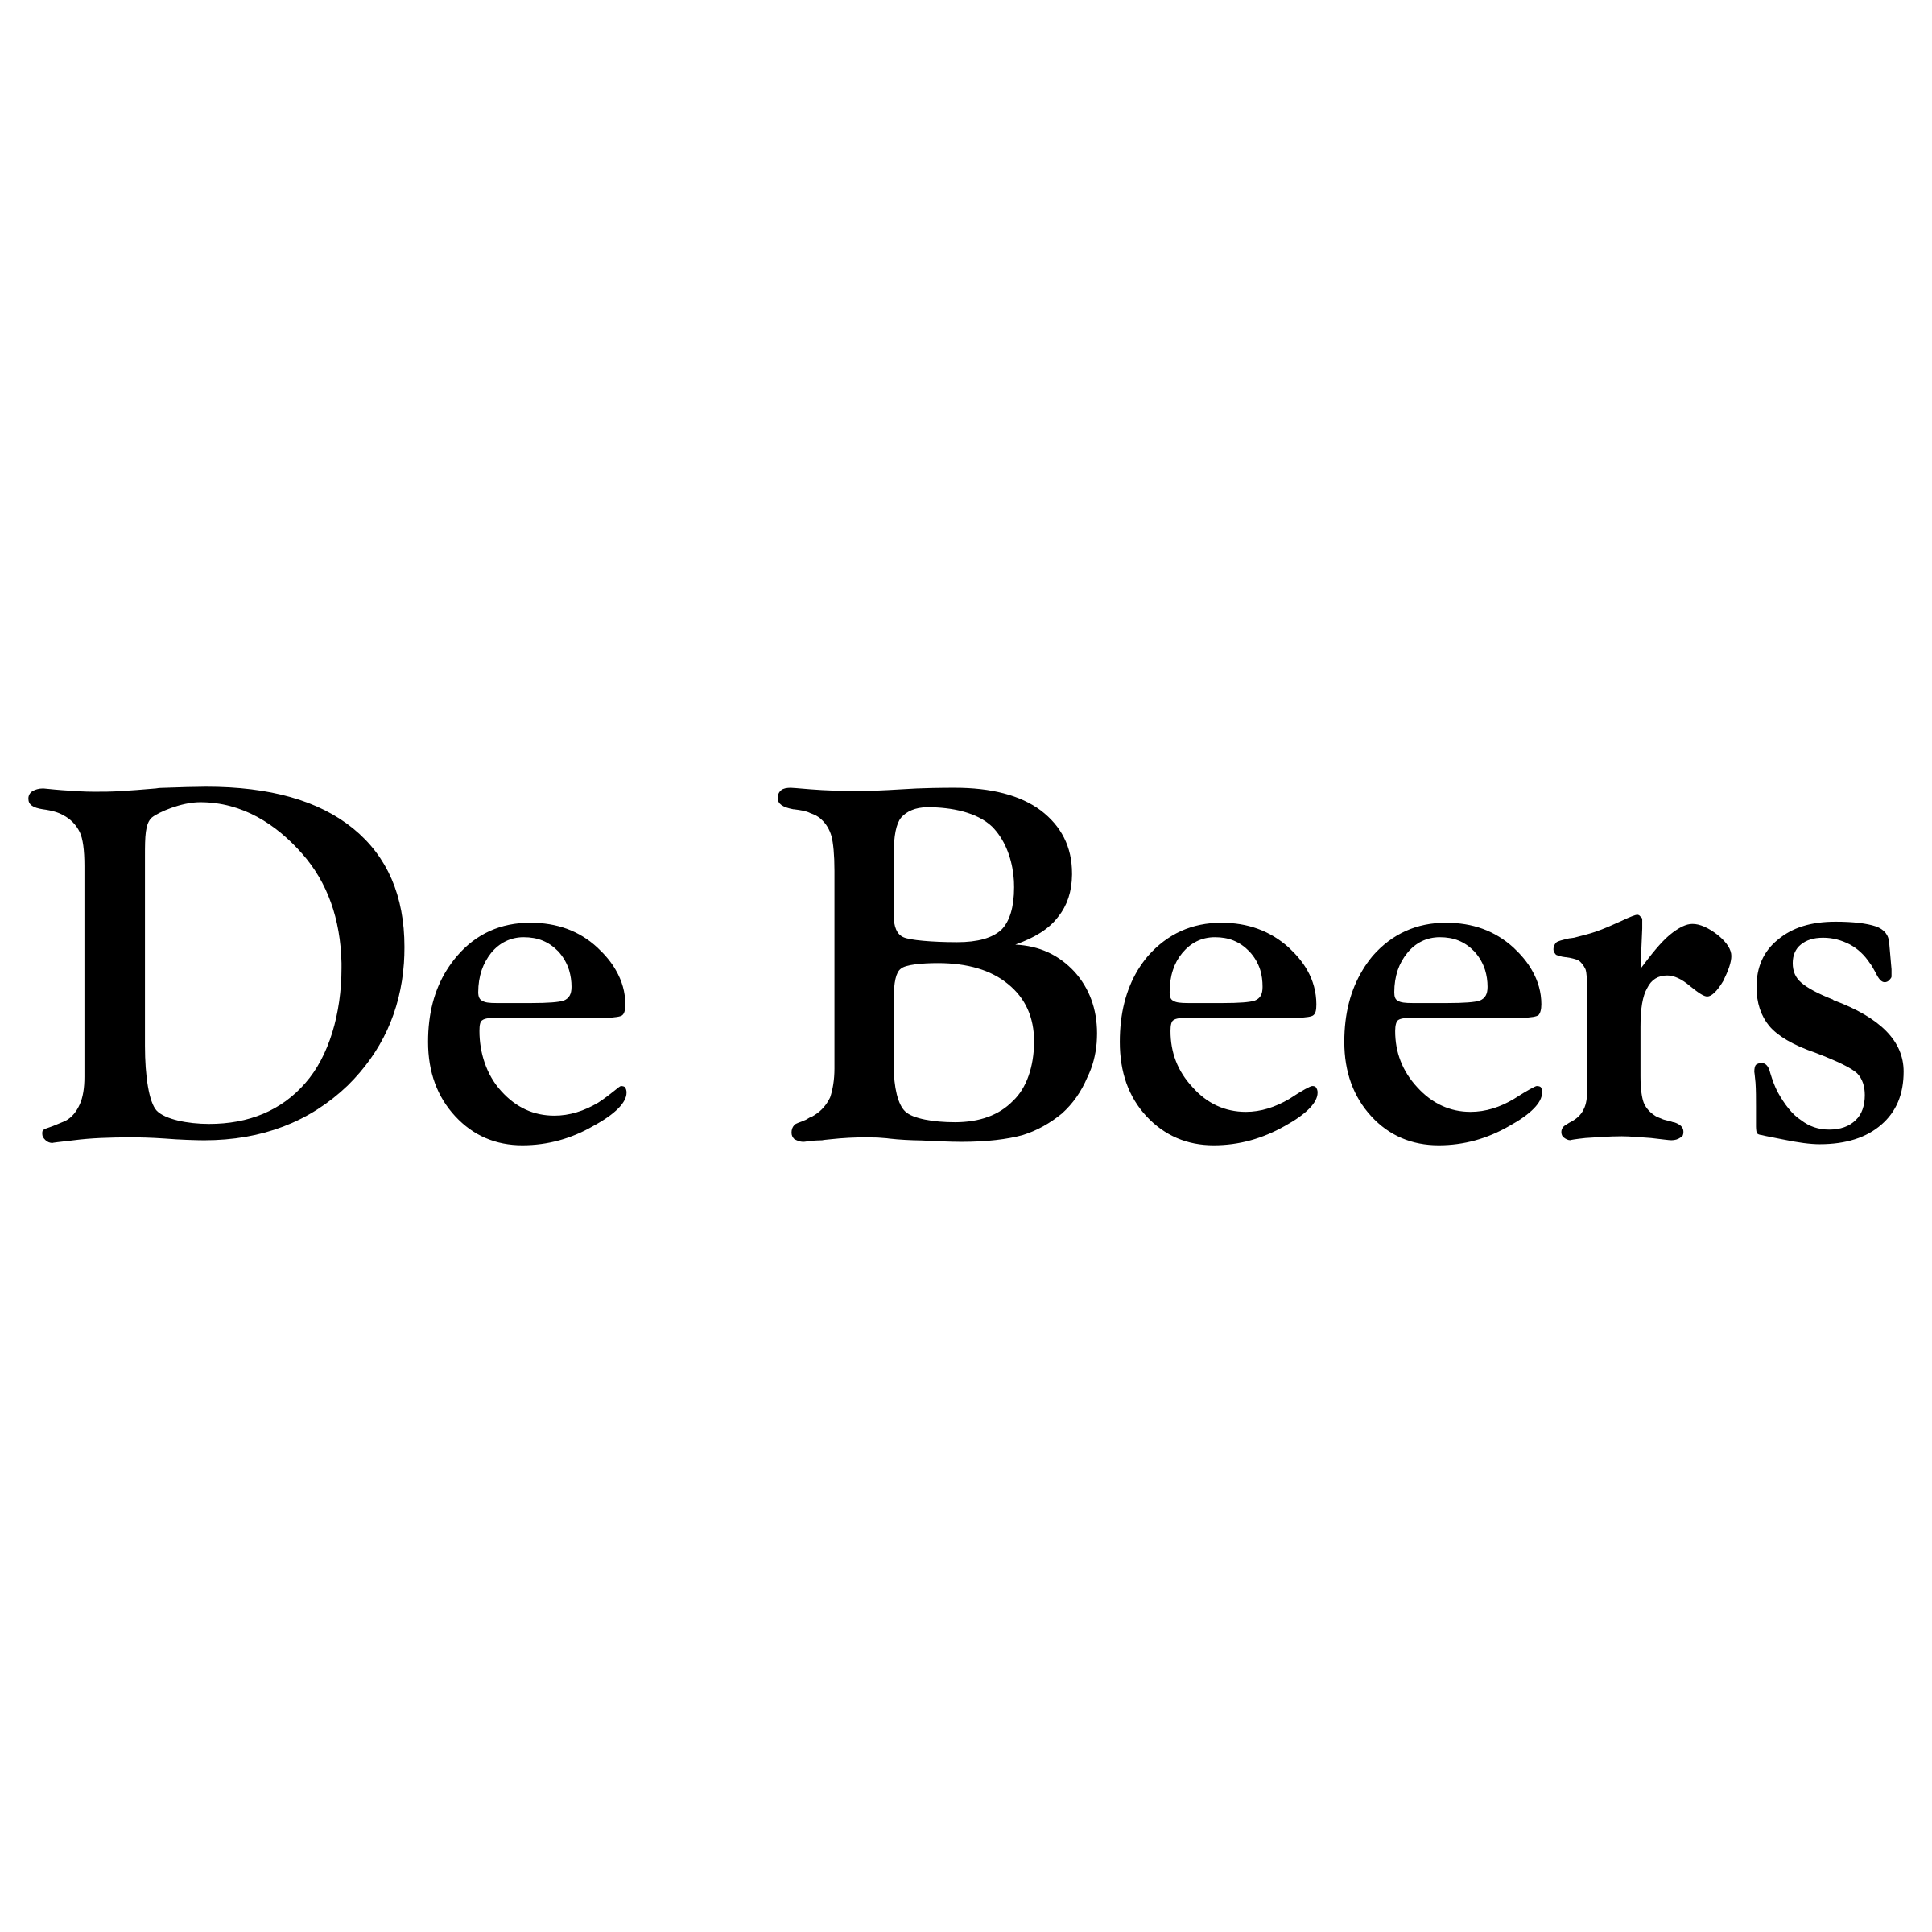 De Beers Logo PNG Transparent & SVG Vector.